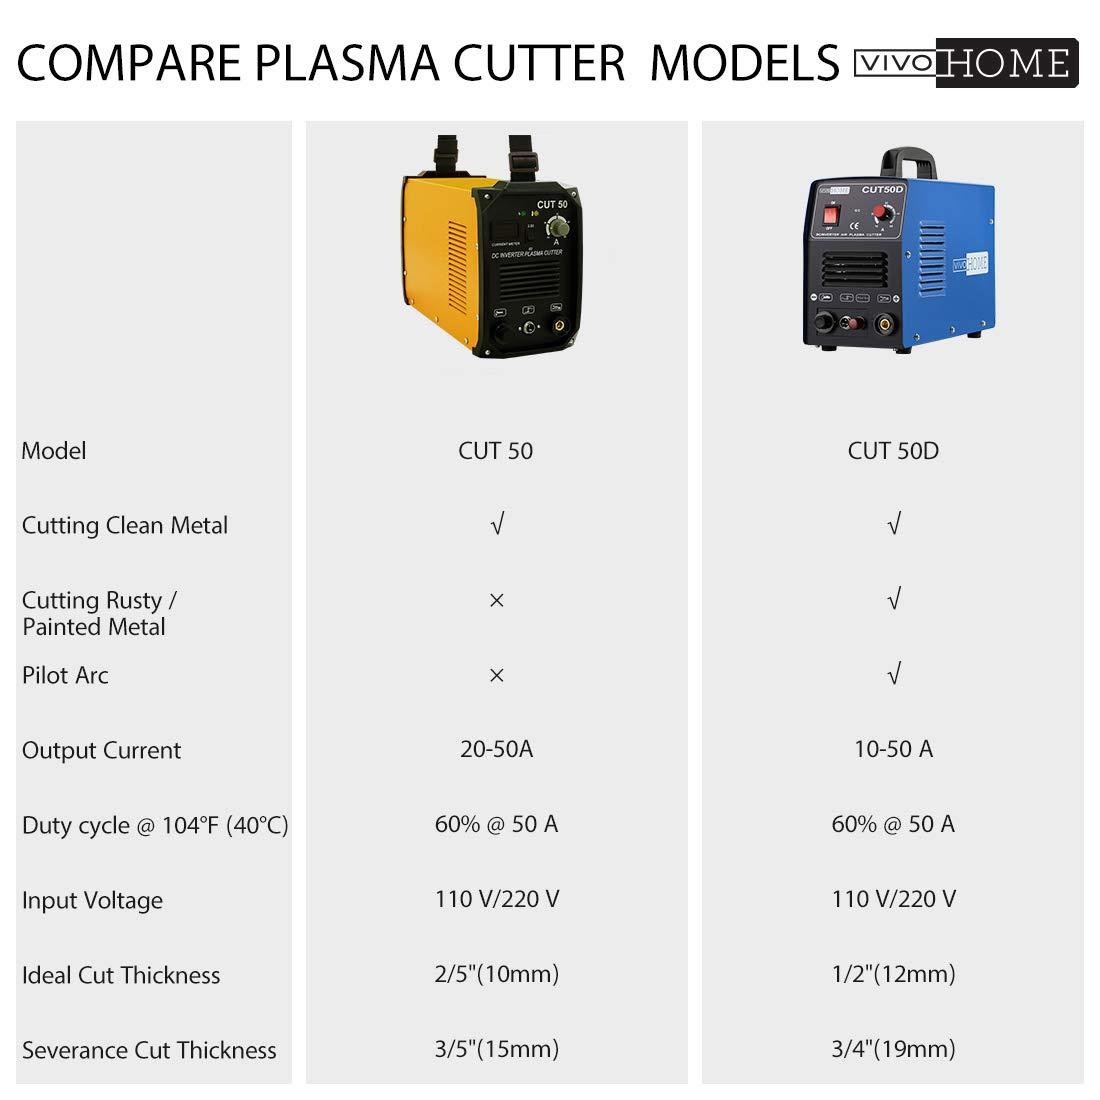 VIVOHOME DC Inverter Plasma Cutter Cutting Machine Dual Voltage 110V/220V CUT-50 by VIVOHOME (Image #6)